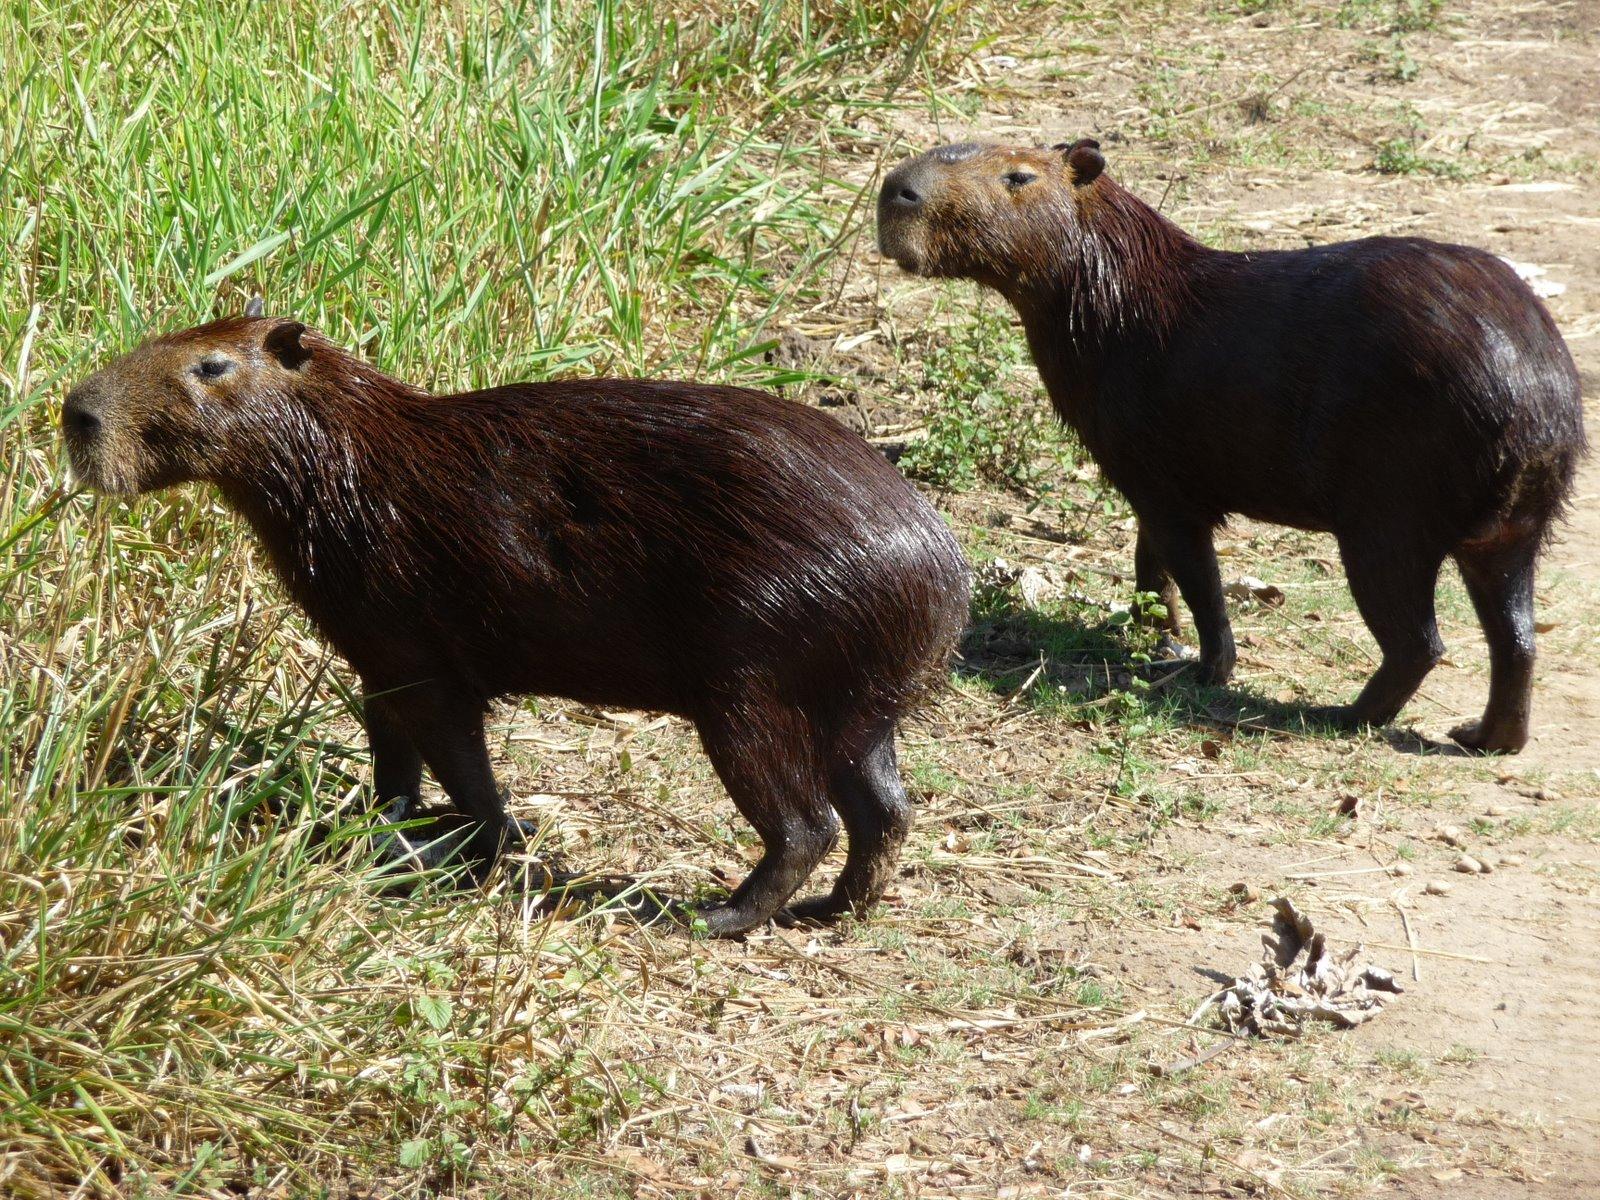 [1000505_Brasil_Pantanal-FazendaSanFrancisco_11-05-2009.JPG]